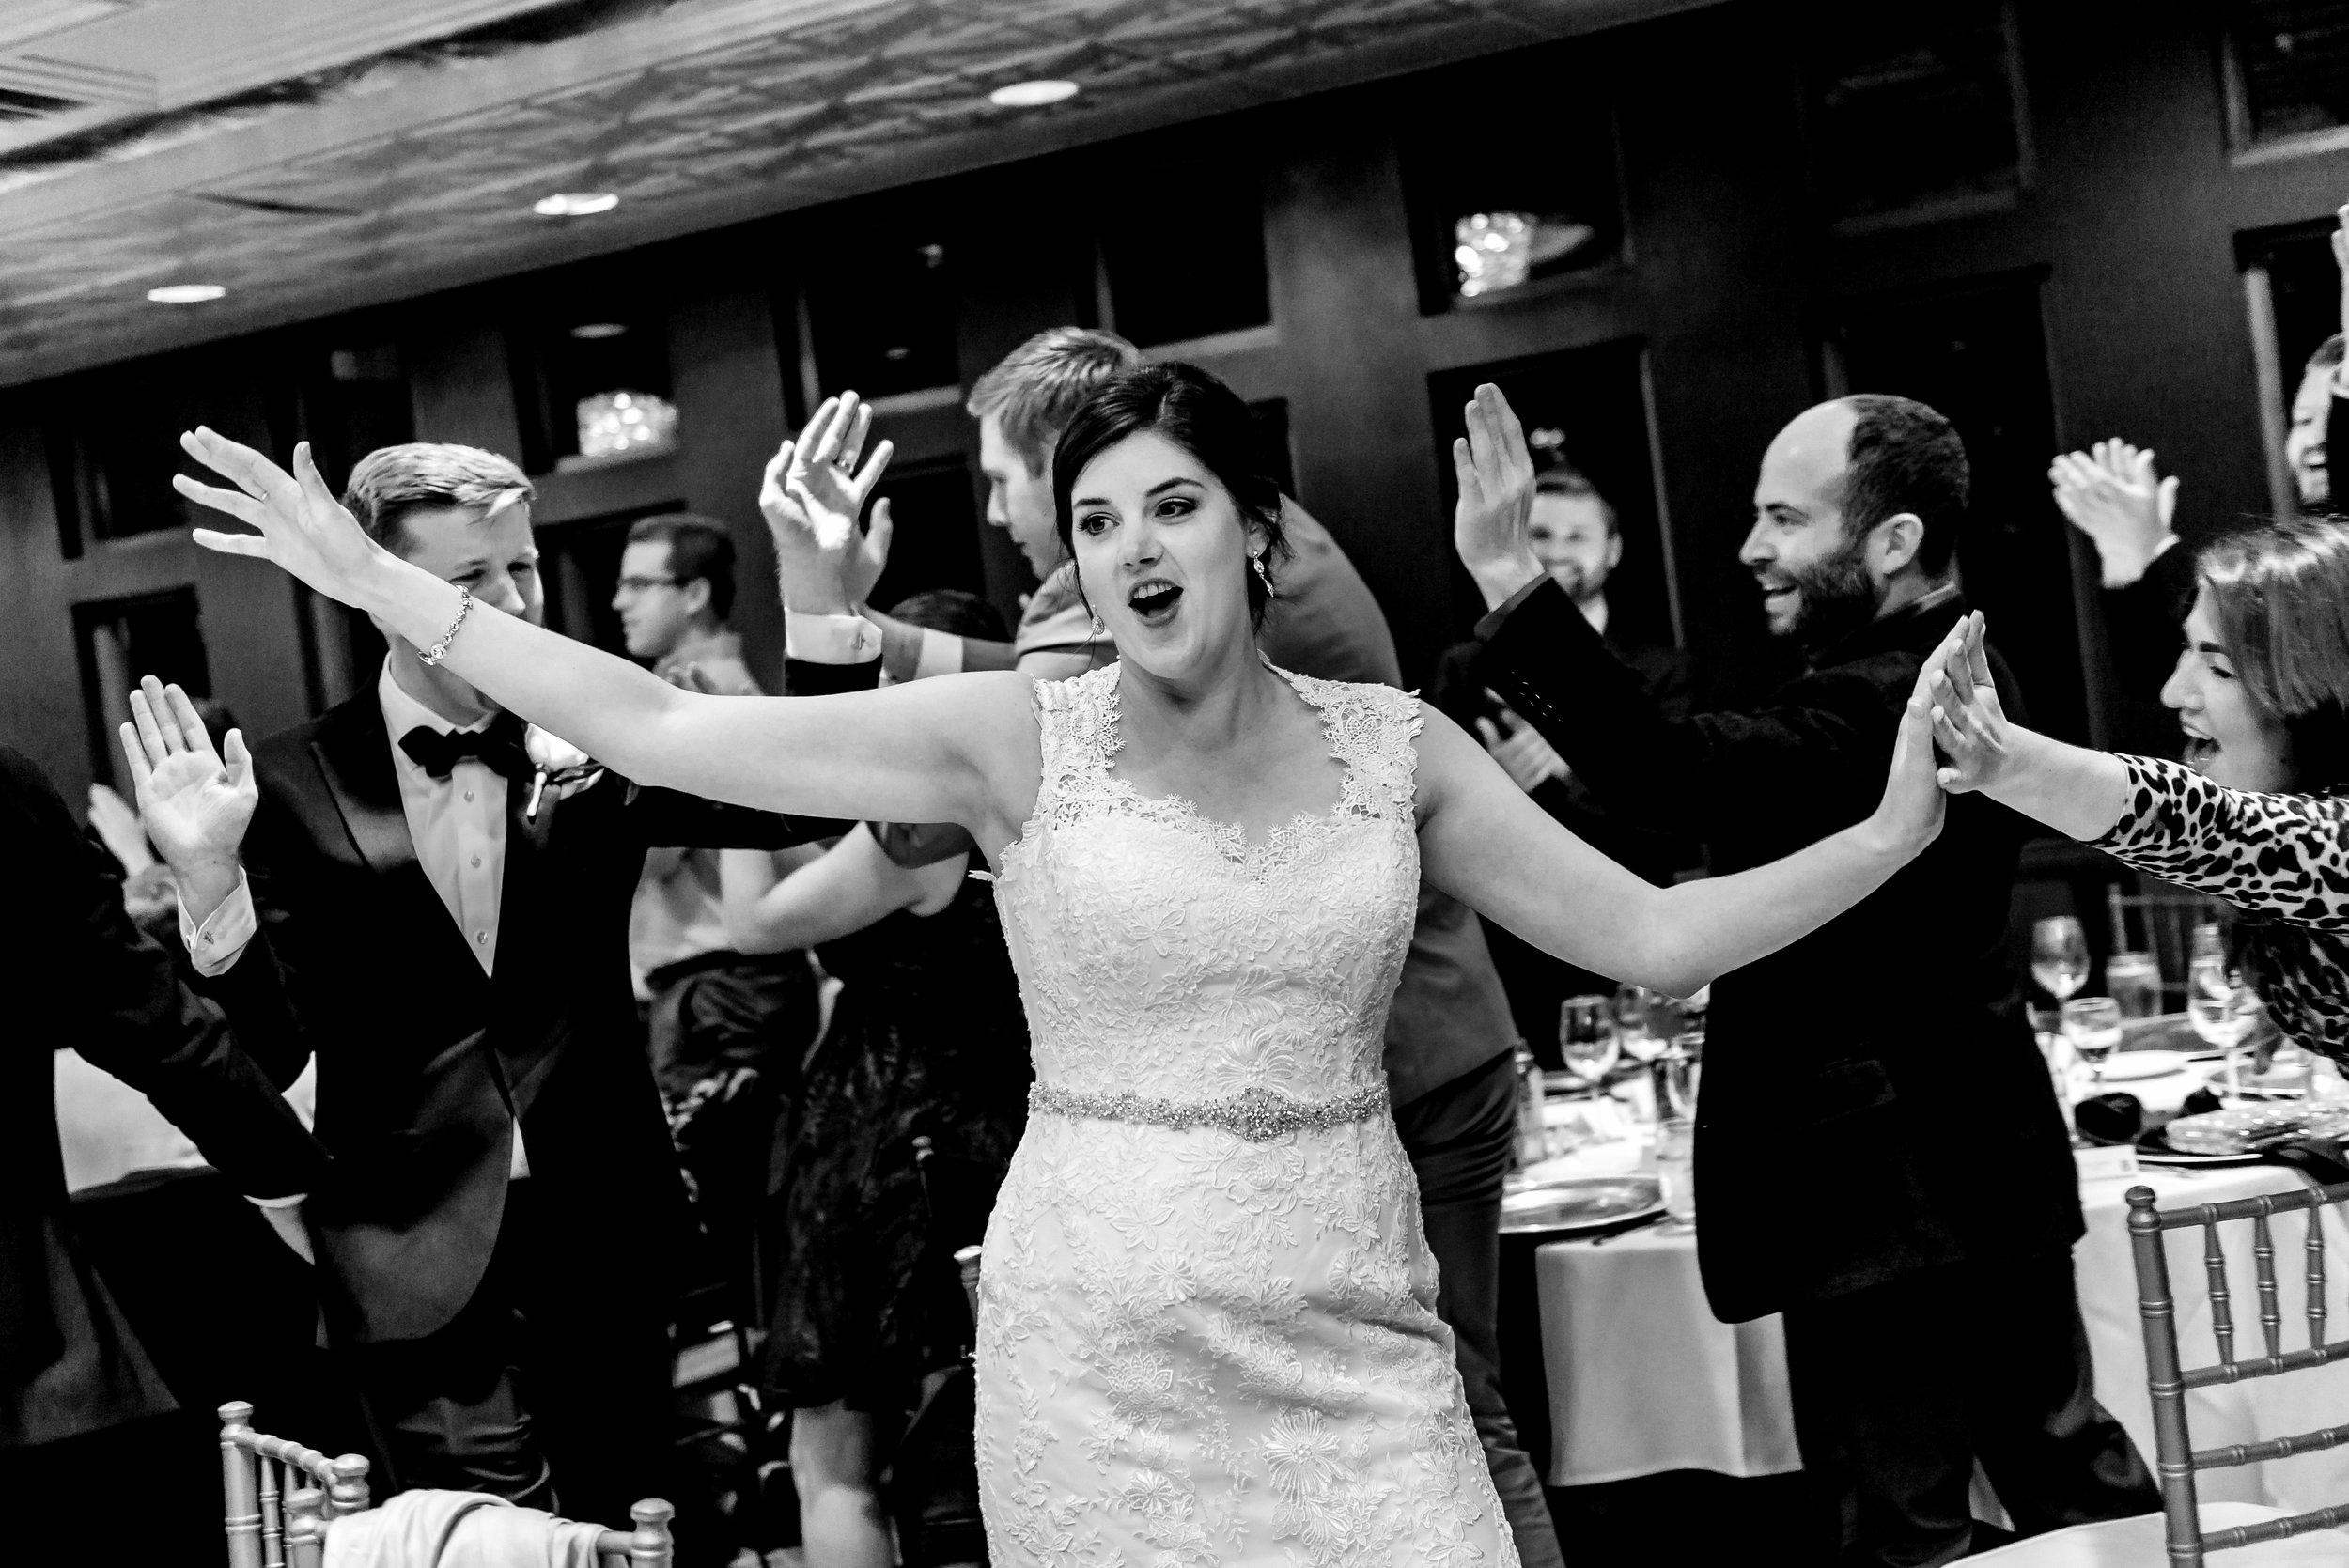 Lauren and Karl - Van Dusen Mansion Wedding and St. Olaf Catholic Church Minneapolis Wedding BW-805.jpg